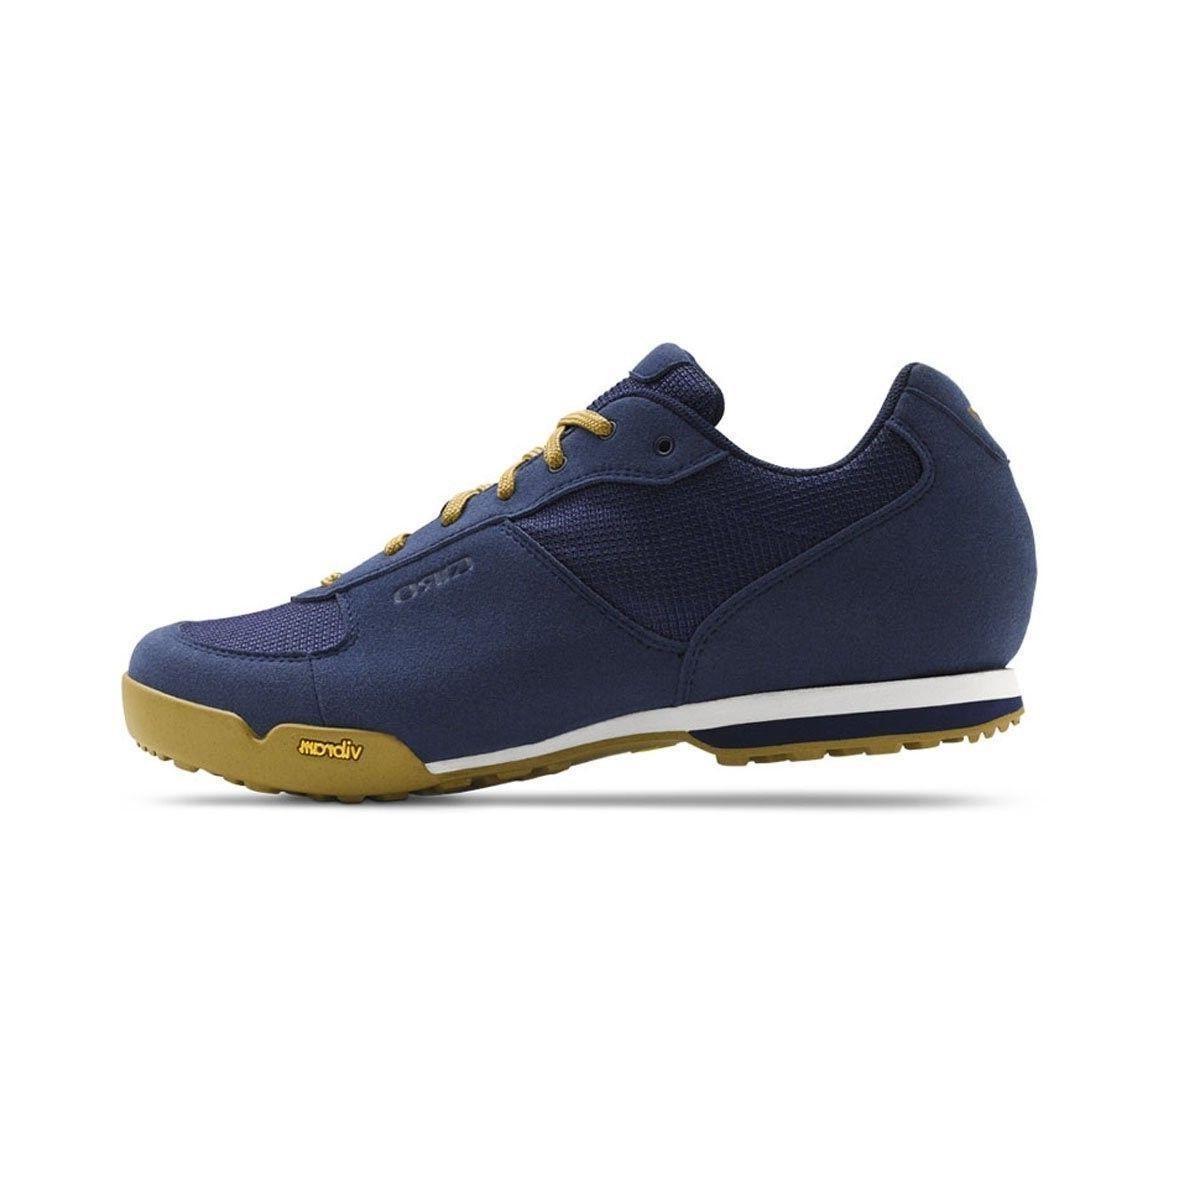 Giro Rumble VR MTB Shoes Dress Blue/Gum 40 EU/ 7.5US